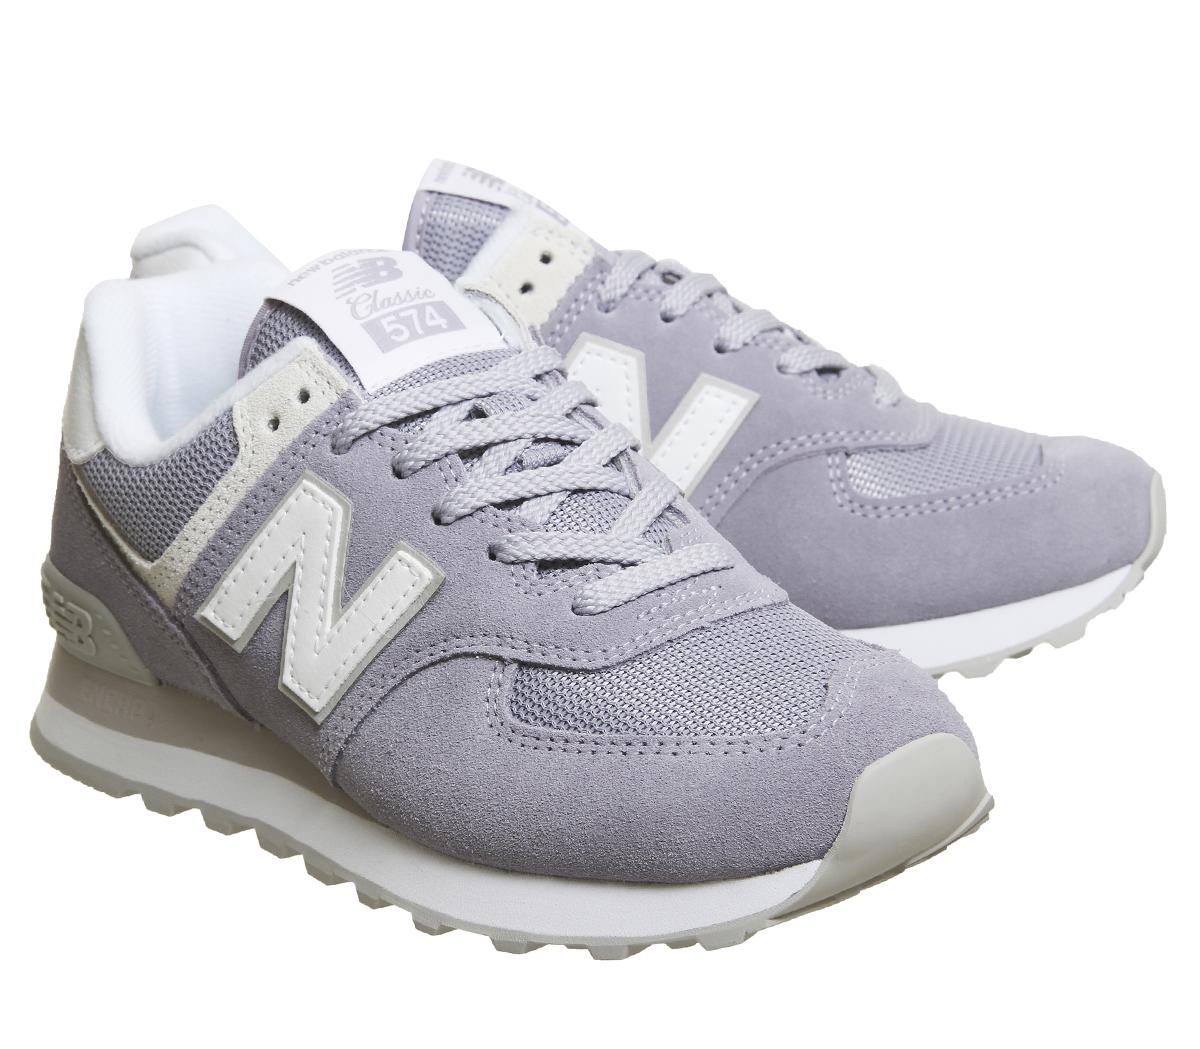 Ebay Zapatillas Violeta 574 Balance Mujer Zapatos New x8wRzAqn